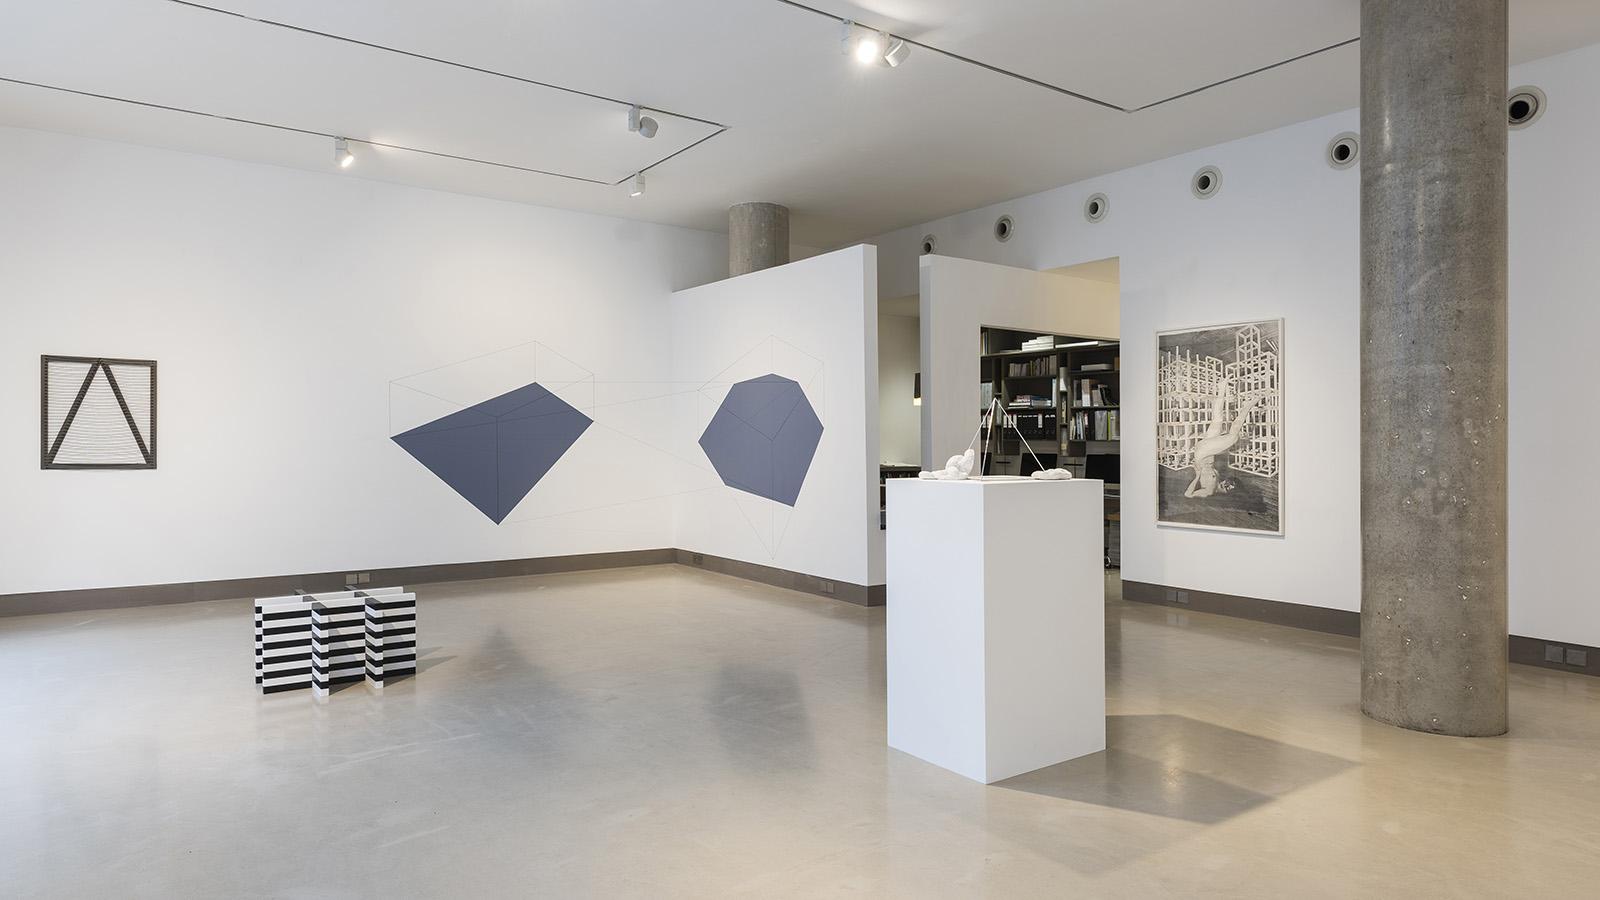 'Minimalist Anyway', installation view at White Rainbow, London, 2017